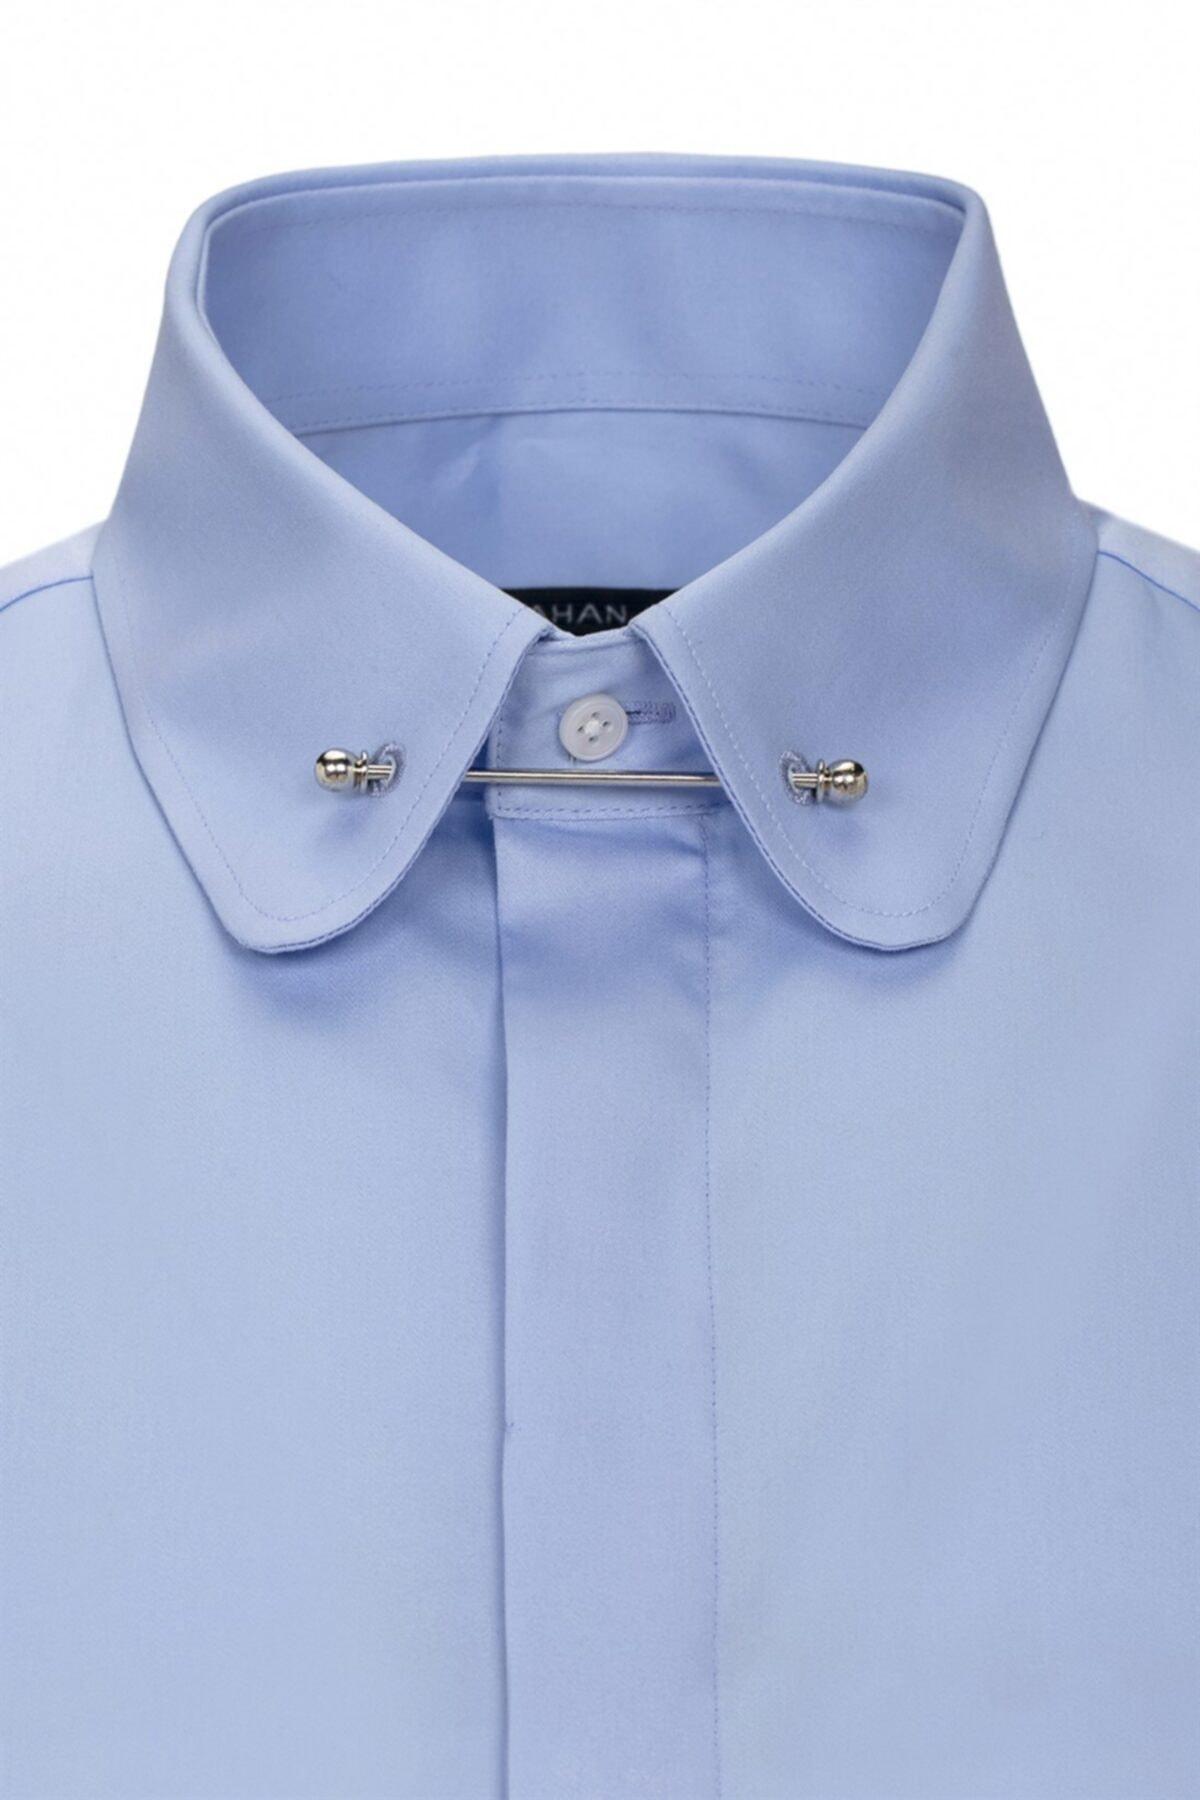 Paşahan Erkek Mavi Slim Fit Bebe Yaka İğneli Gömlek 2